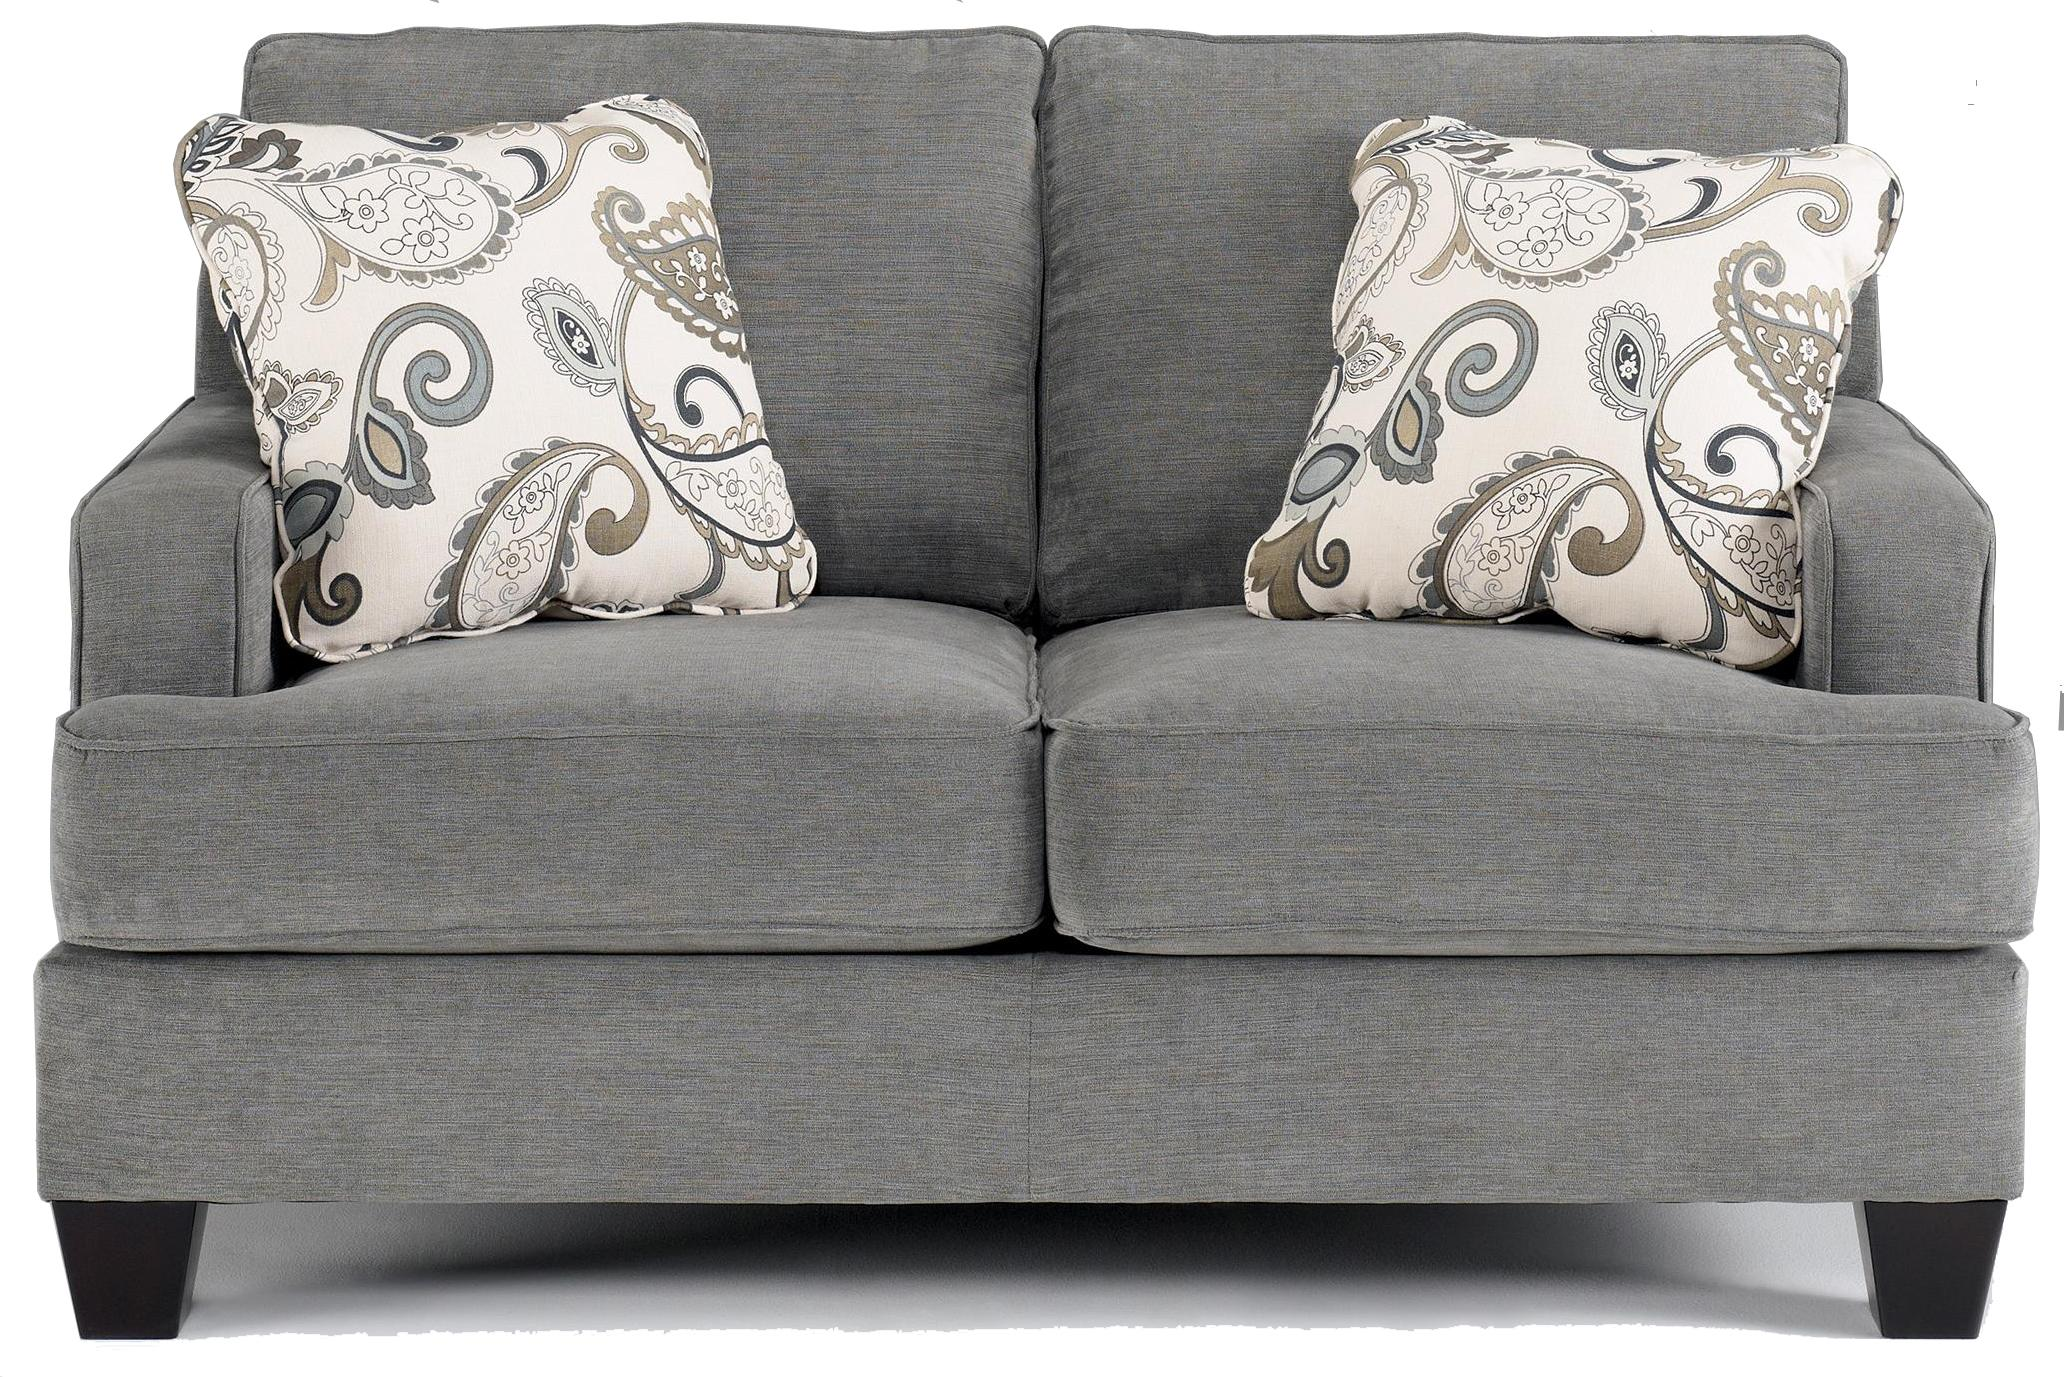 Yvette - Steel Loveseat by Ashley Furniture at Lapeer Furniture & Mattress Center